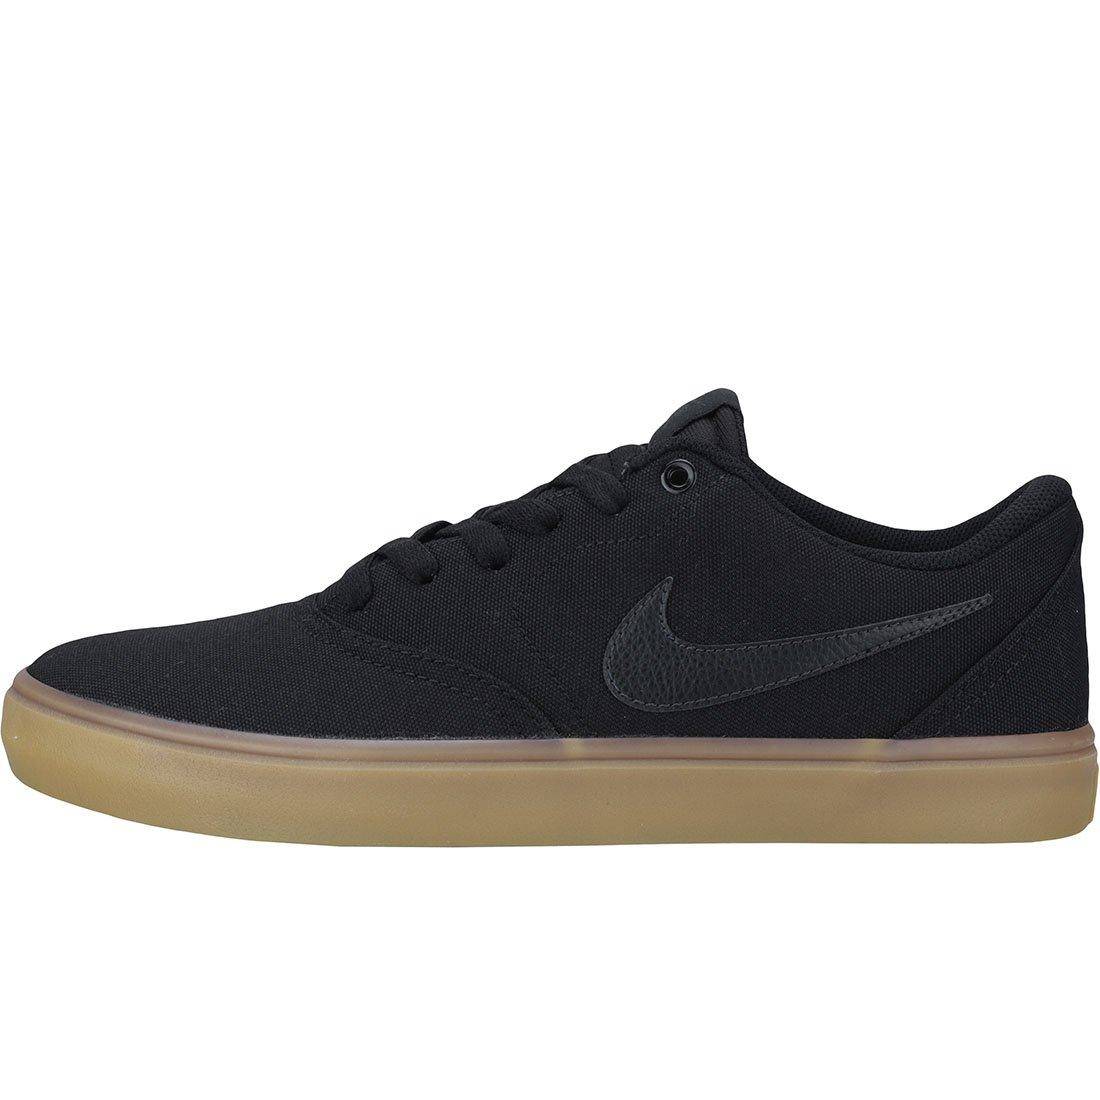 Nike Men's SB Check Solarsoft Canvas Skateboarding Shoes Black/Black-Gum Light Brown 10 by Nike (Image #5)